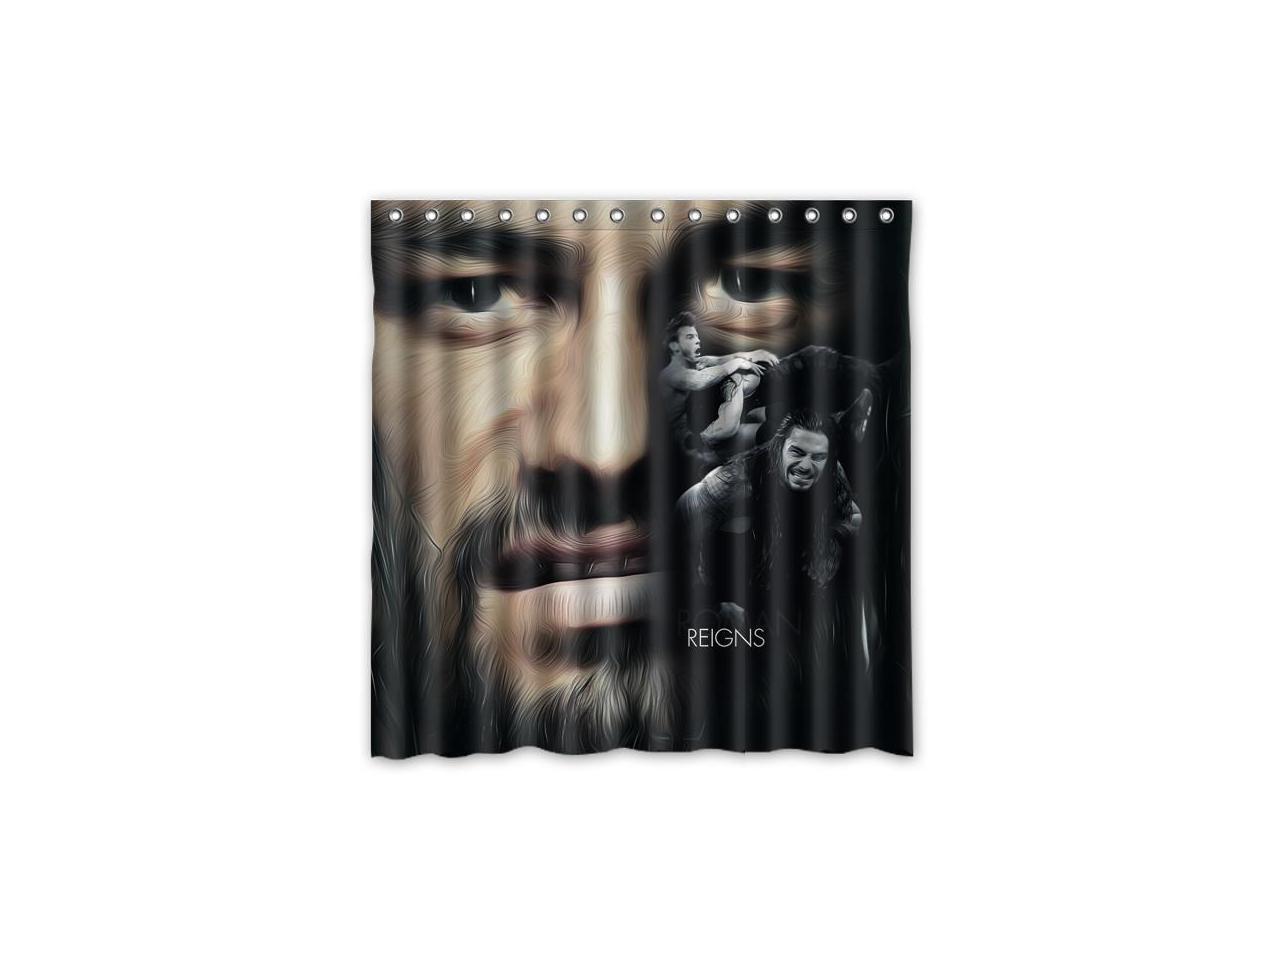 Roman Reigns Design Polyester Fabric Bath Shower Curtain 180x180 Cm Waterproof And Mildewproof Shower Curtains Newegg Com